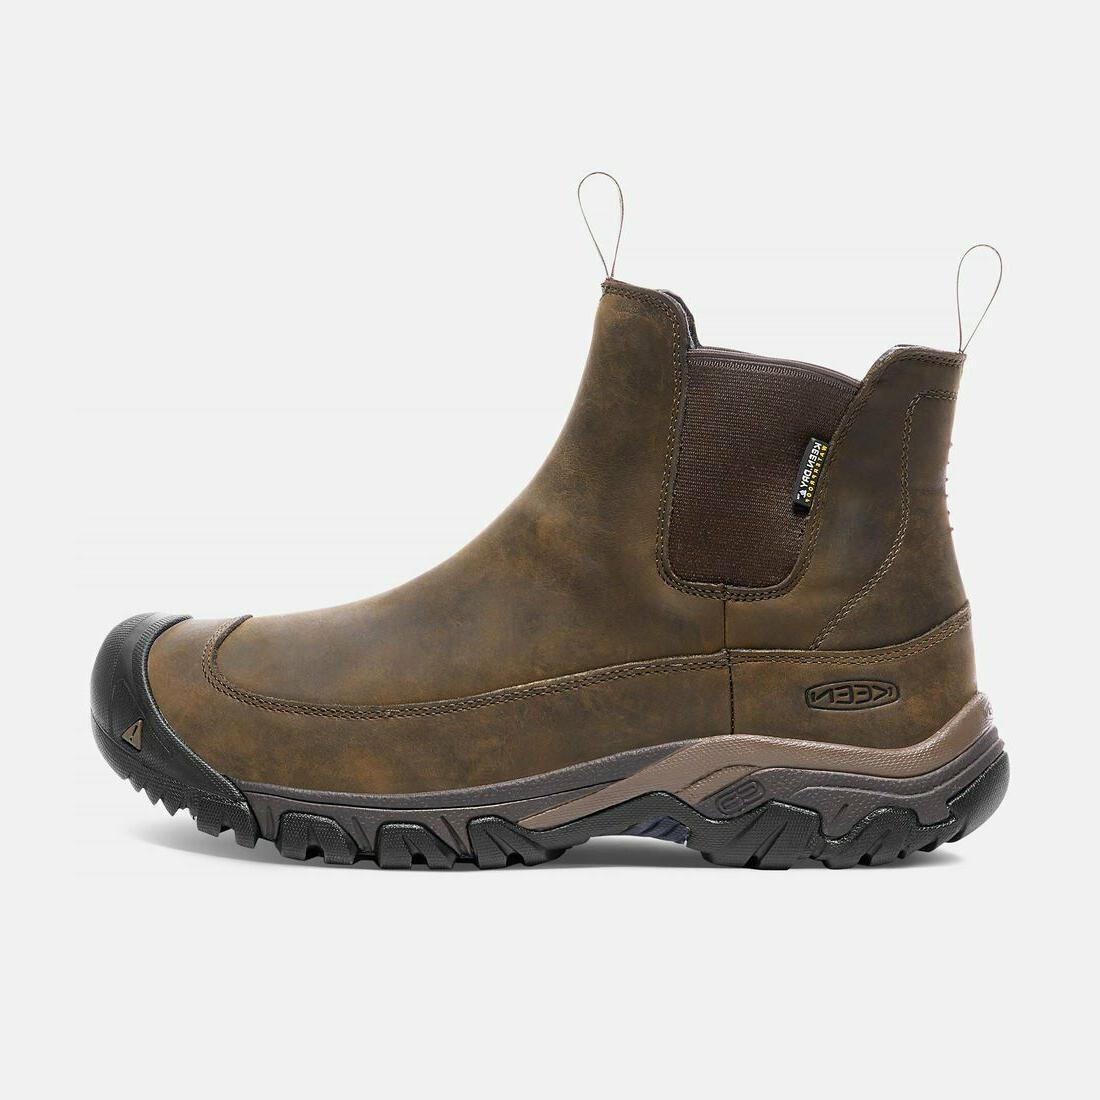 KEEN Men's Anchorage III Pull-On Insulated Waterproof